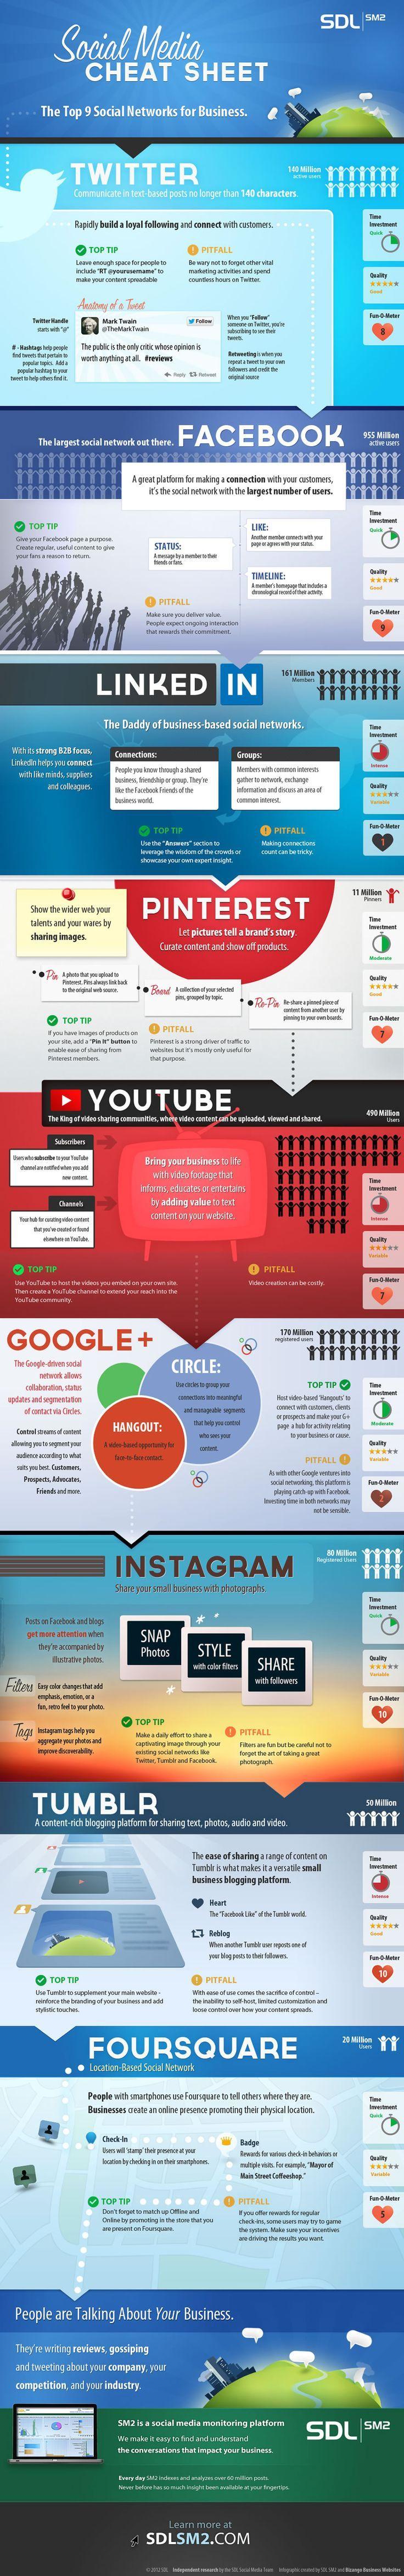 Ultimate Tips * Social Media Cheat Sheet For Businesses {Infographic]#SMM #socialmediamarketing #marketing #business #startup